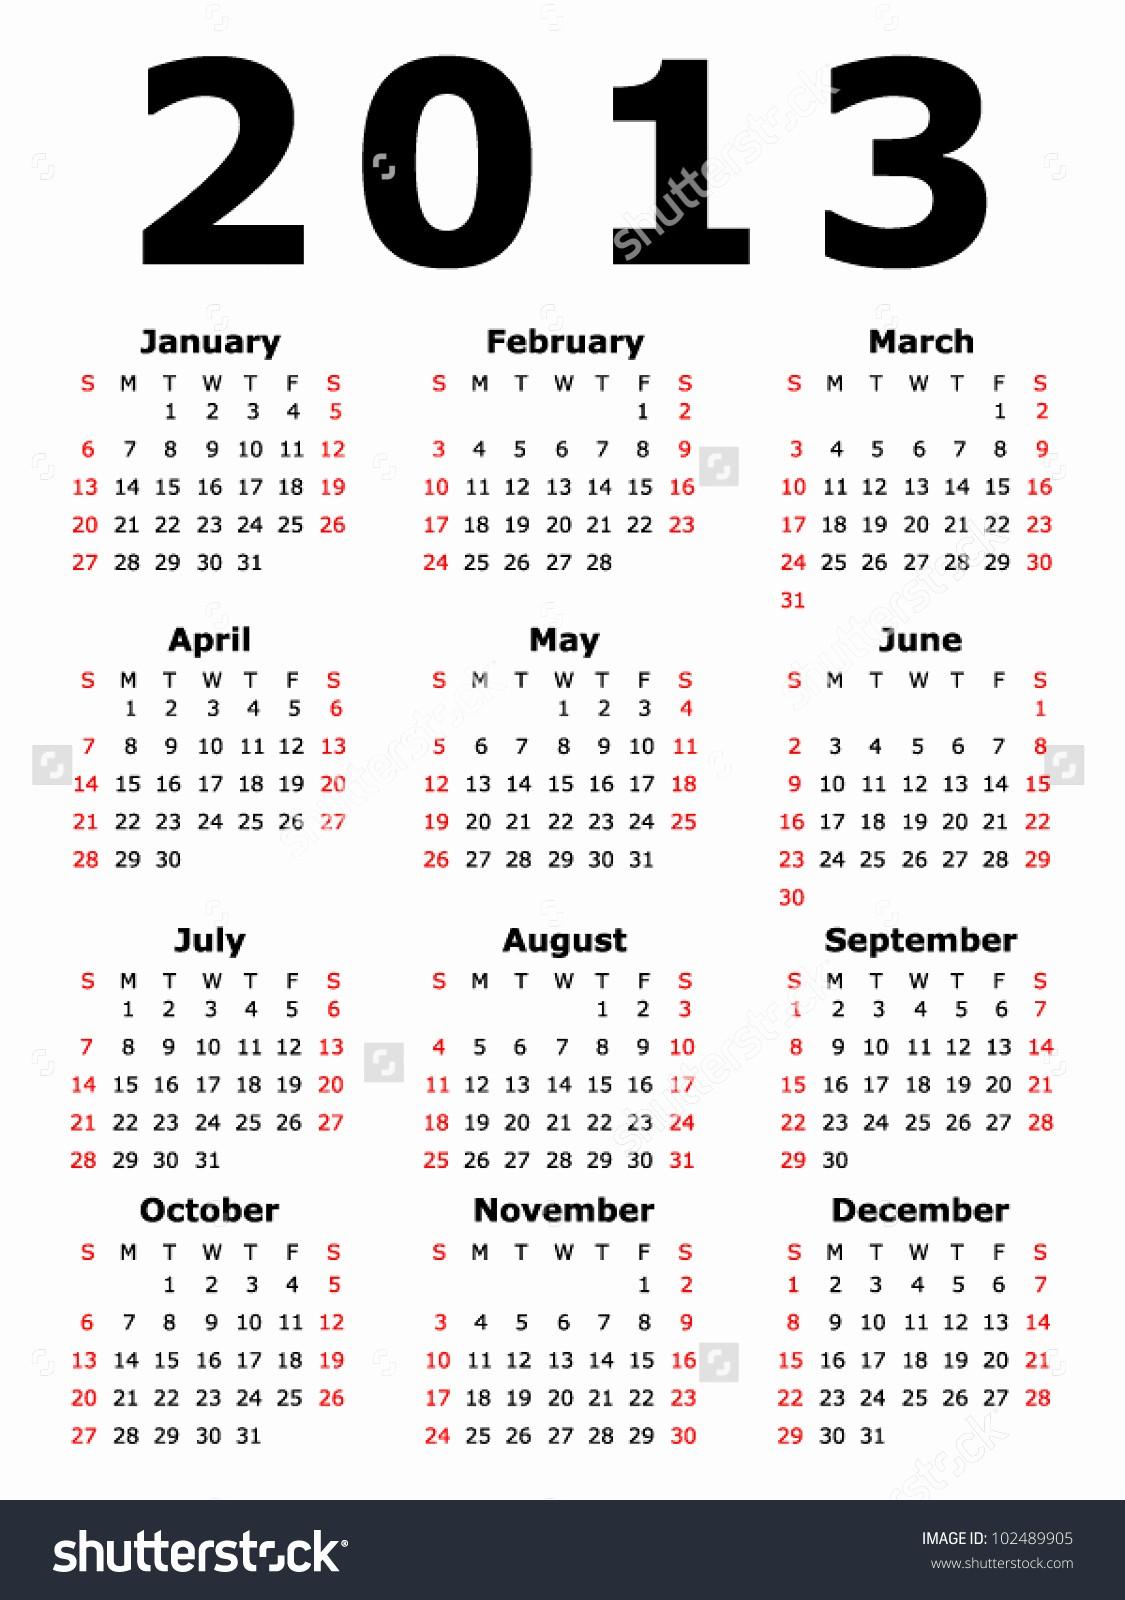 2013 Calendar Printable One Page Best Of 2013 Calendar – 2017 Printable Calendar